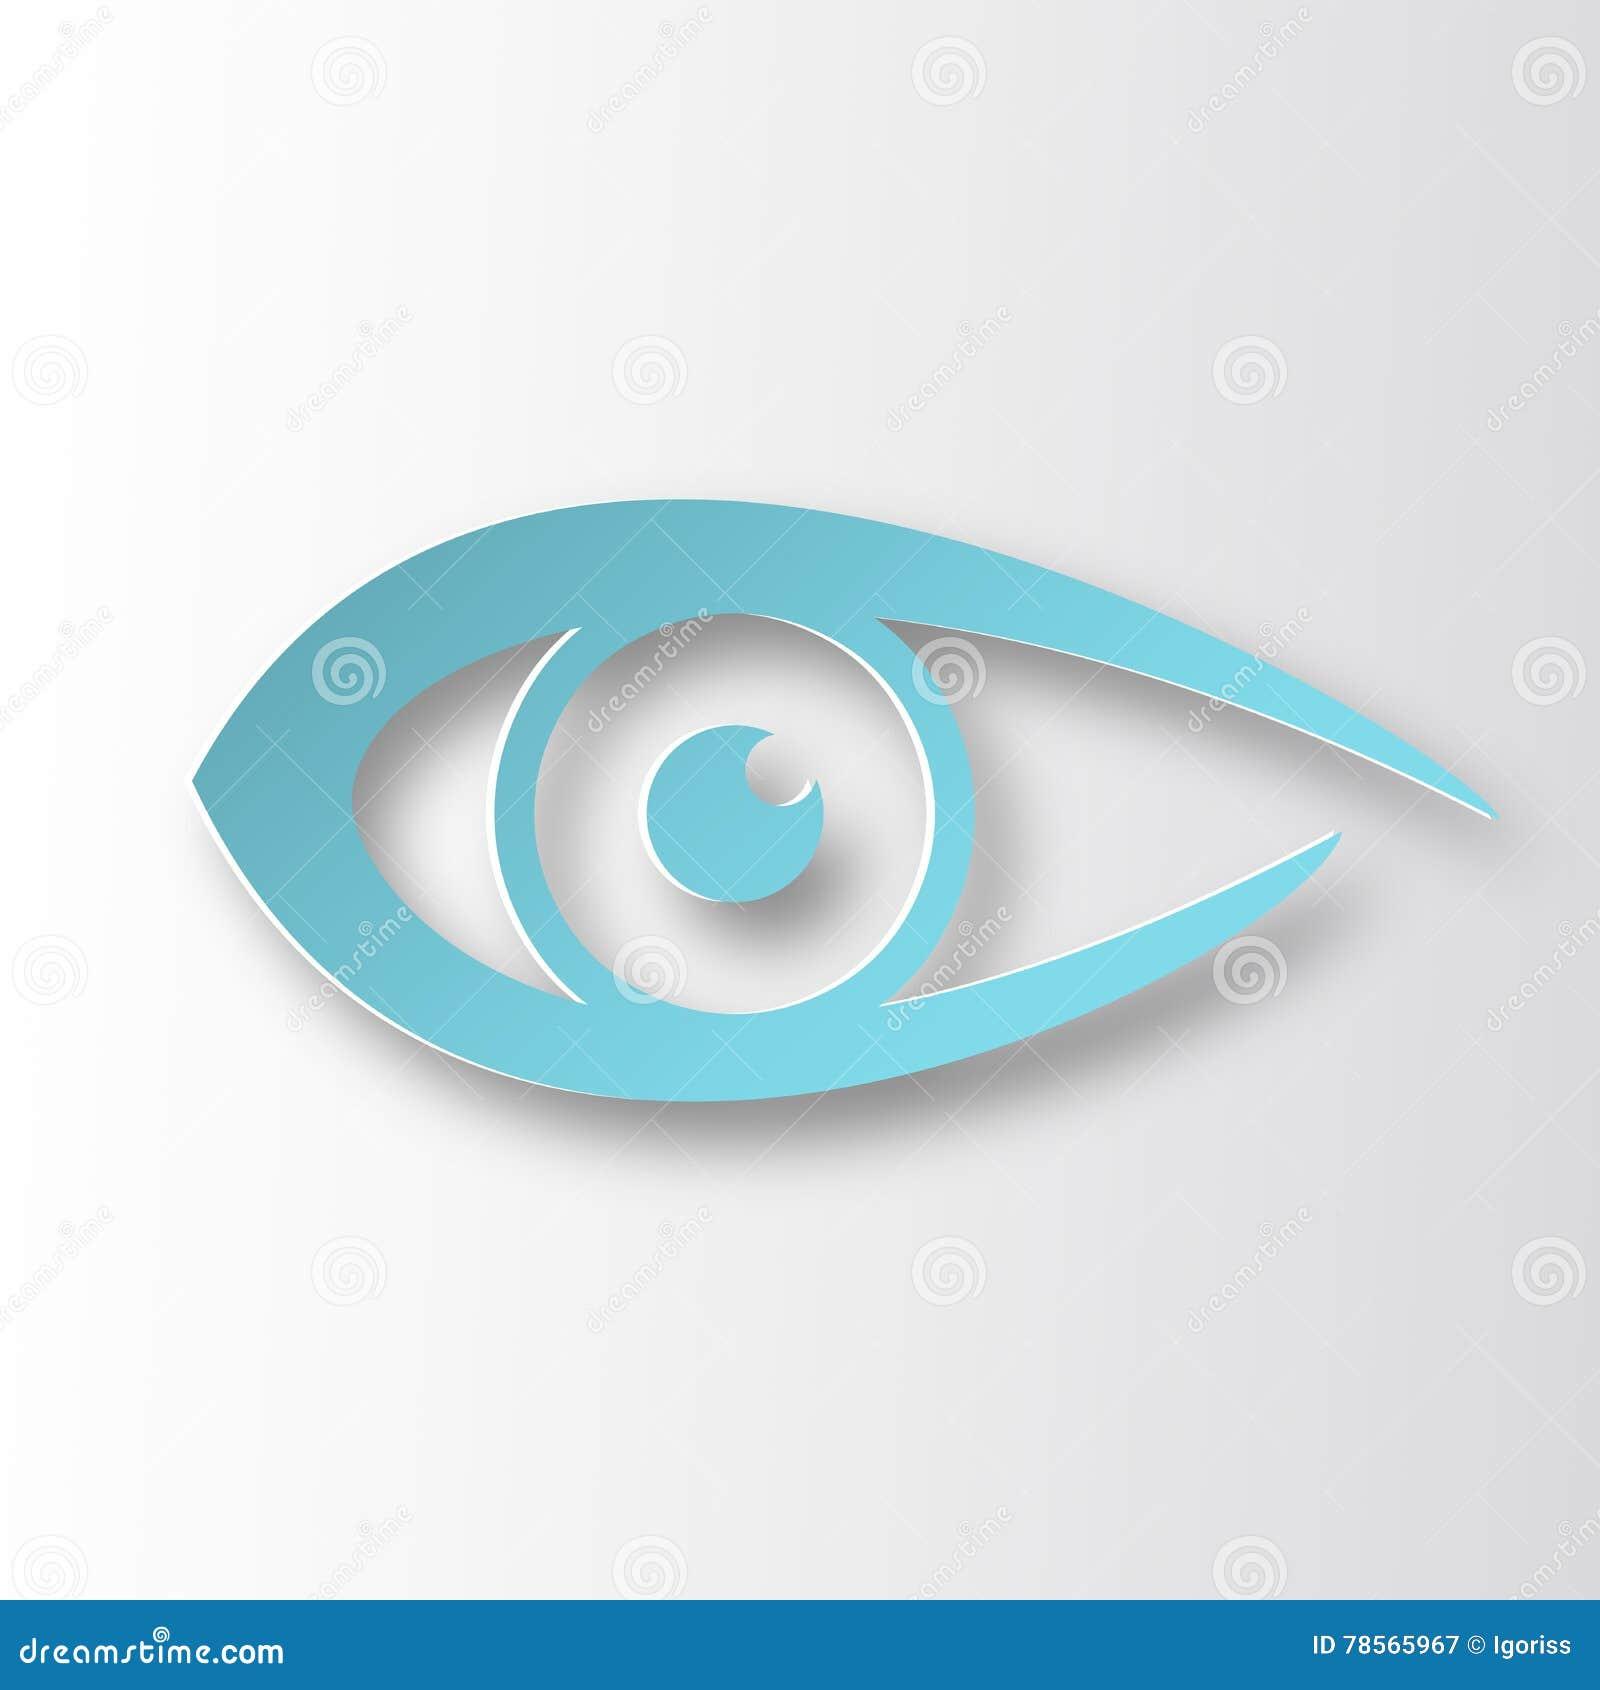 Check Mark Clip Art Eyes World Wide Clip Art Website